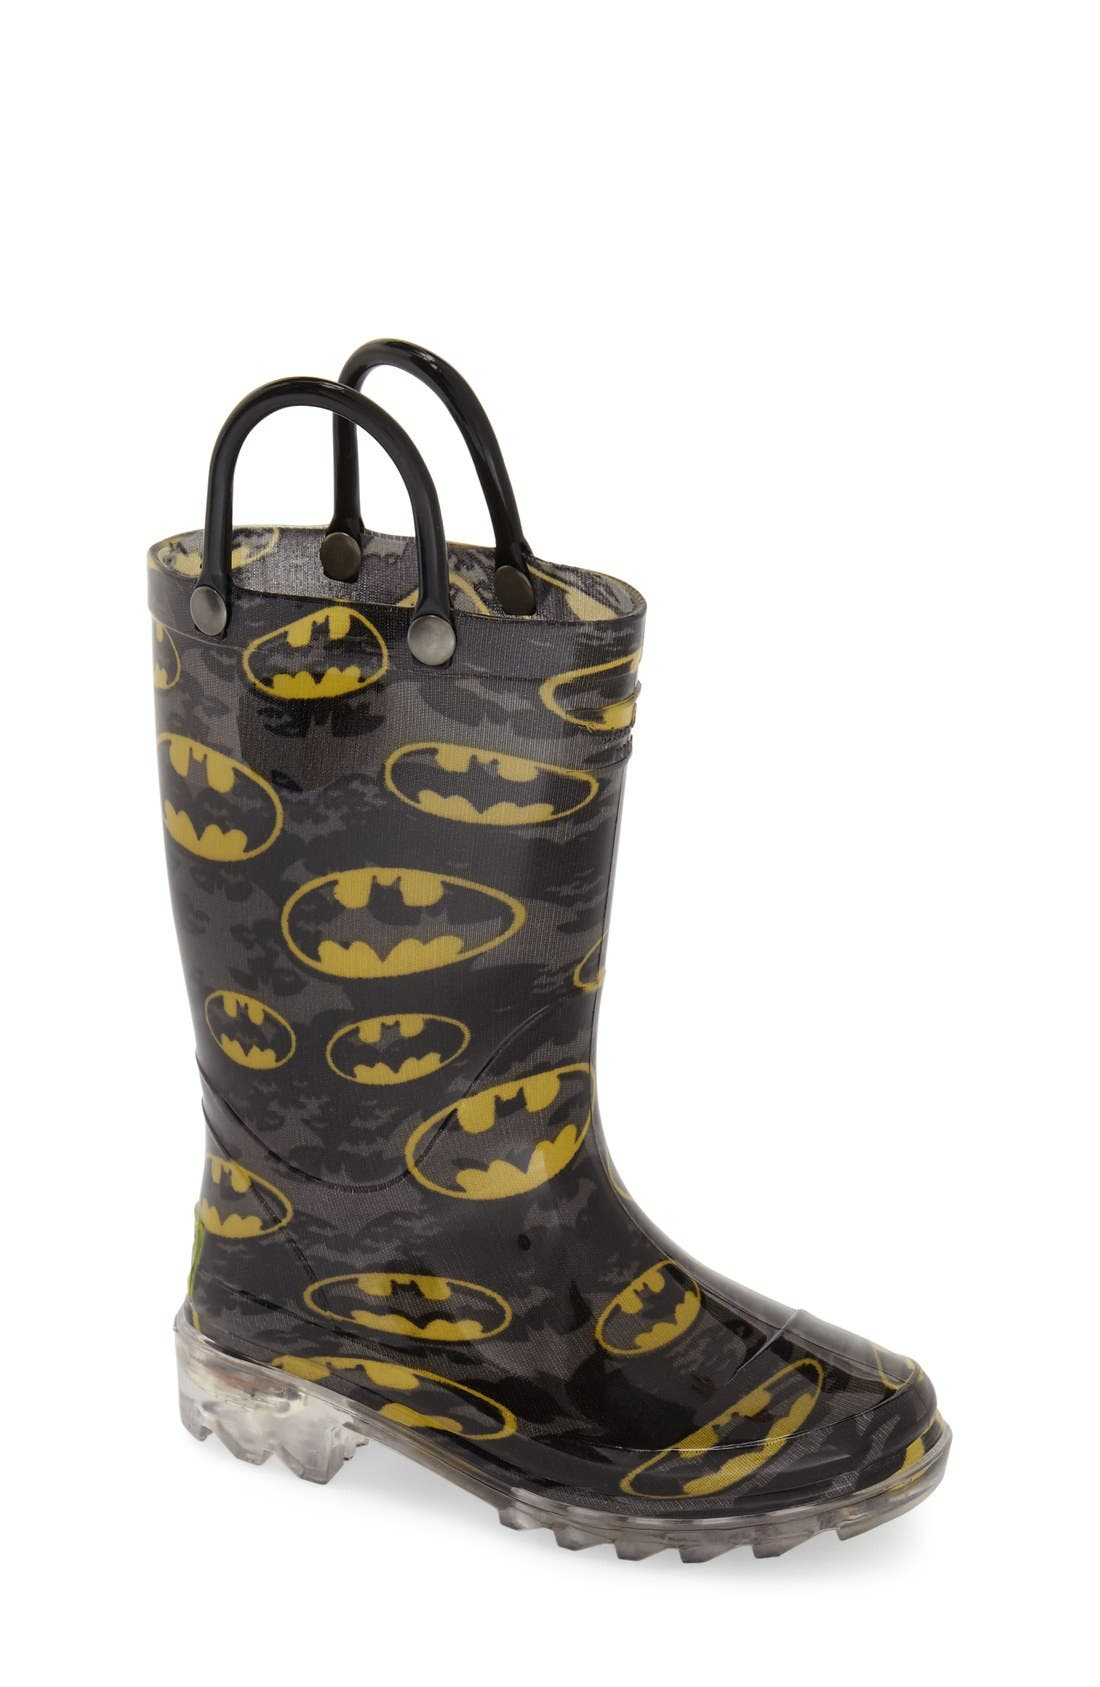 'Batman Signal' Light-Up Rain Boot,                             Main thumbnail 1, color,                             Black